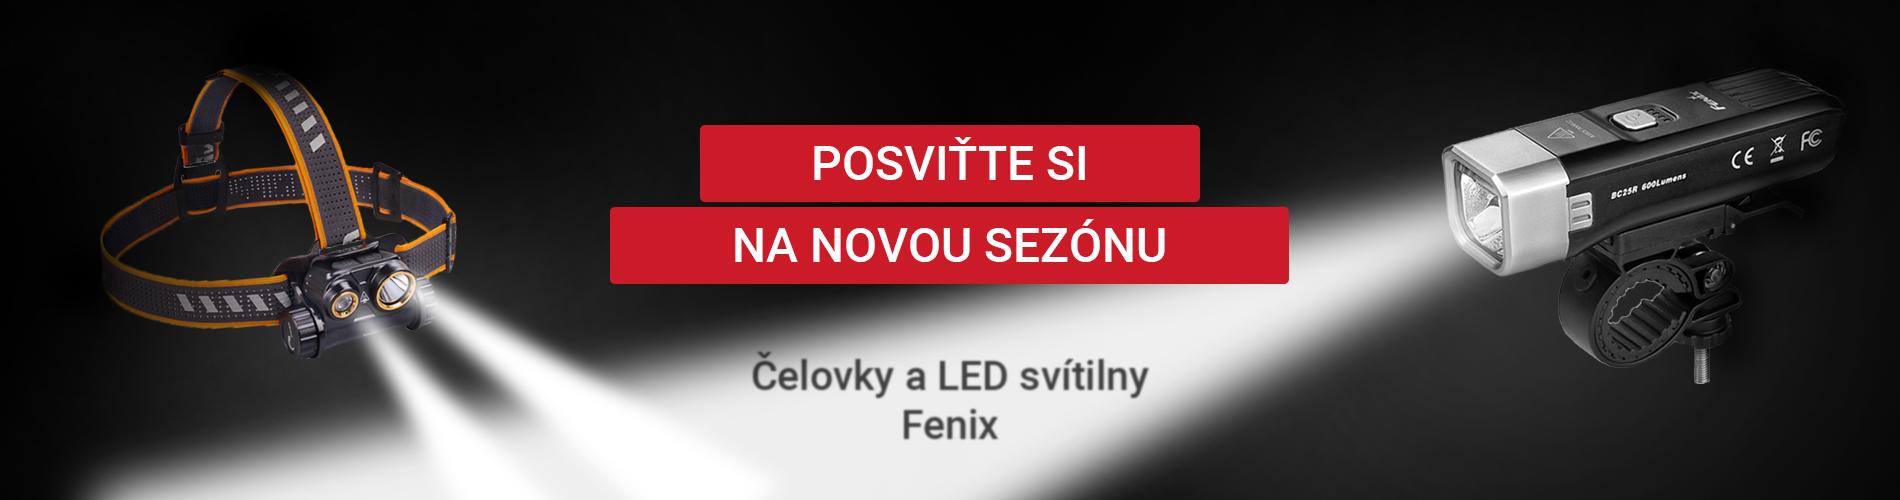 Fenix Desktop